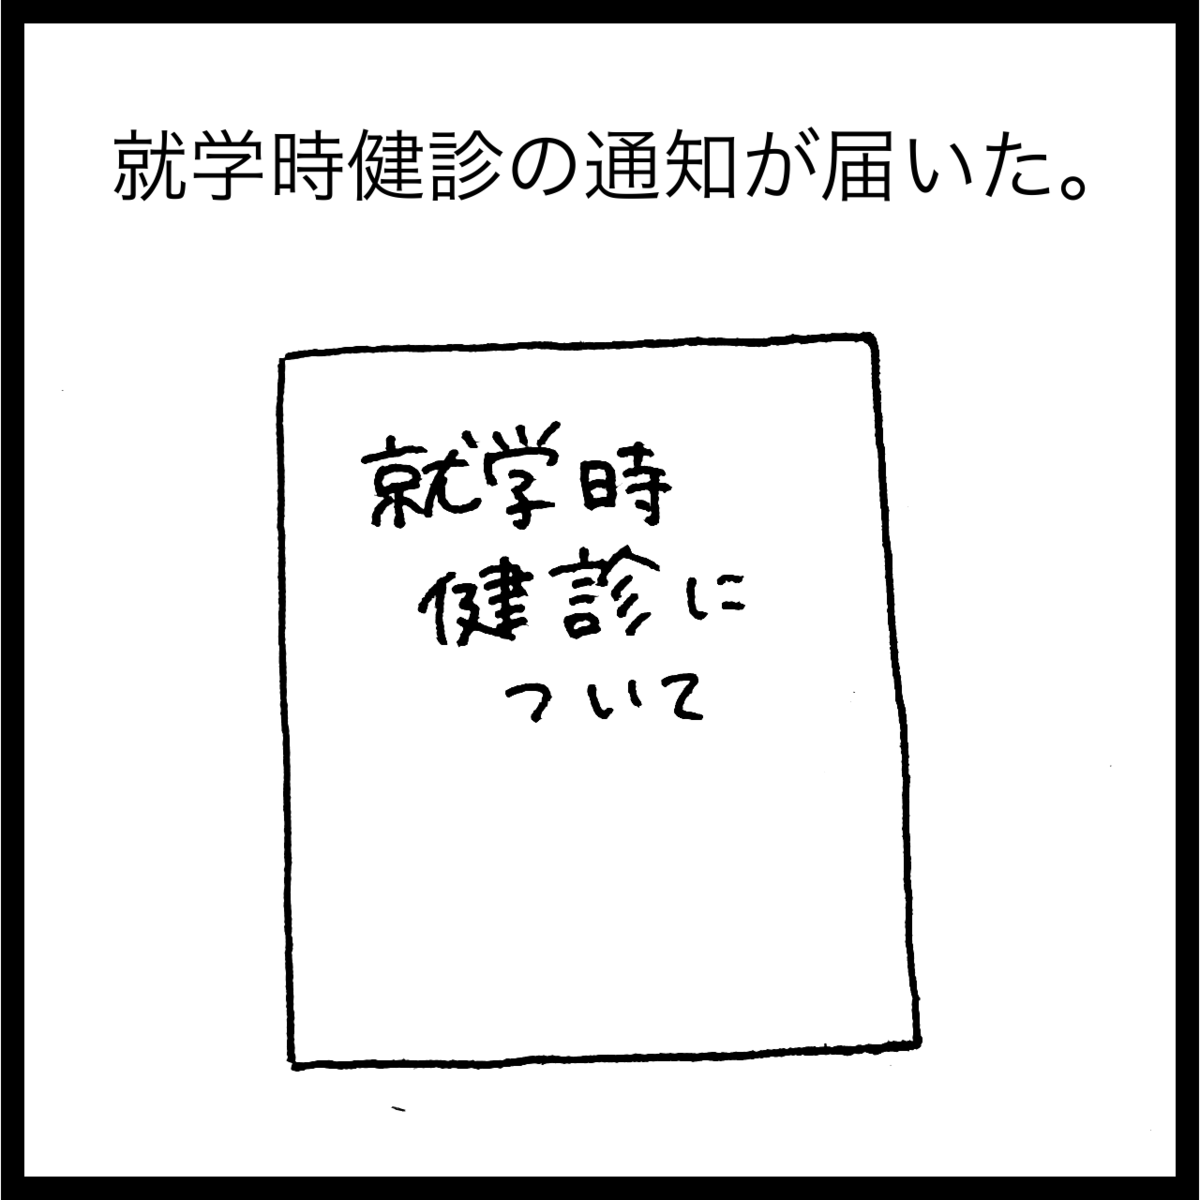 f:id:komyusyomama:20210914130129p:plain